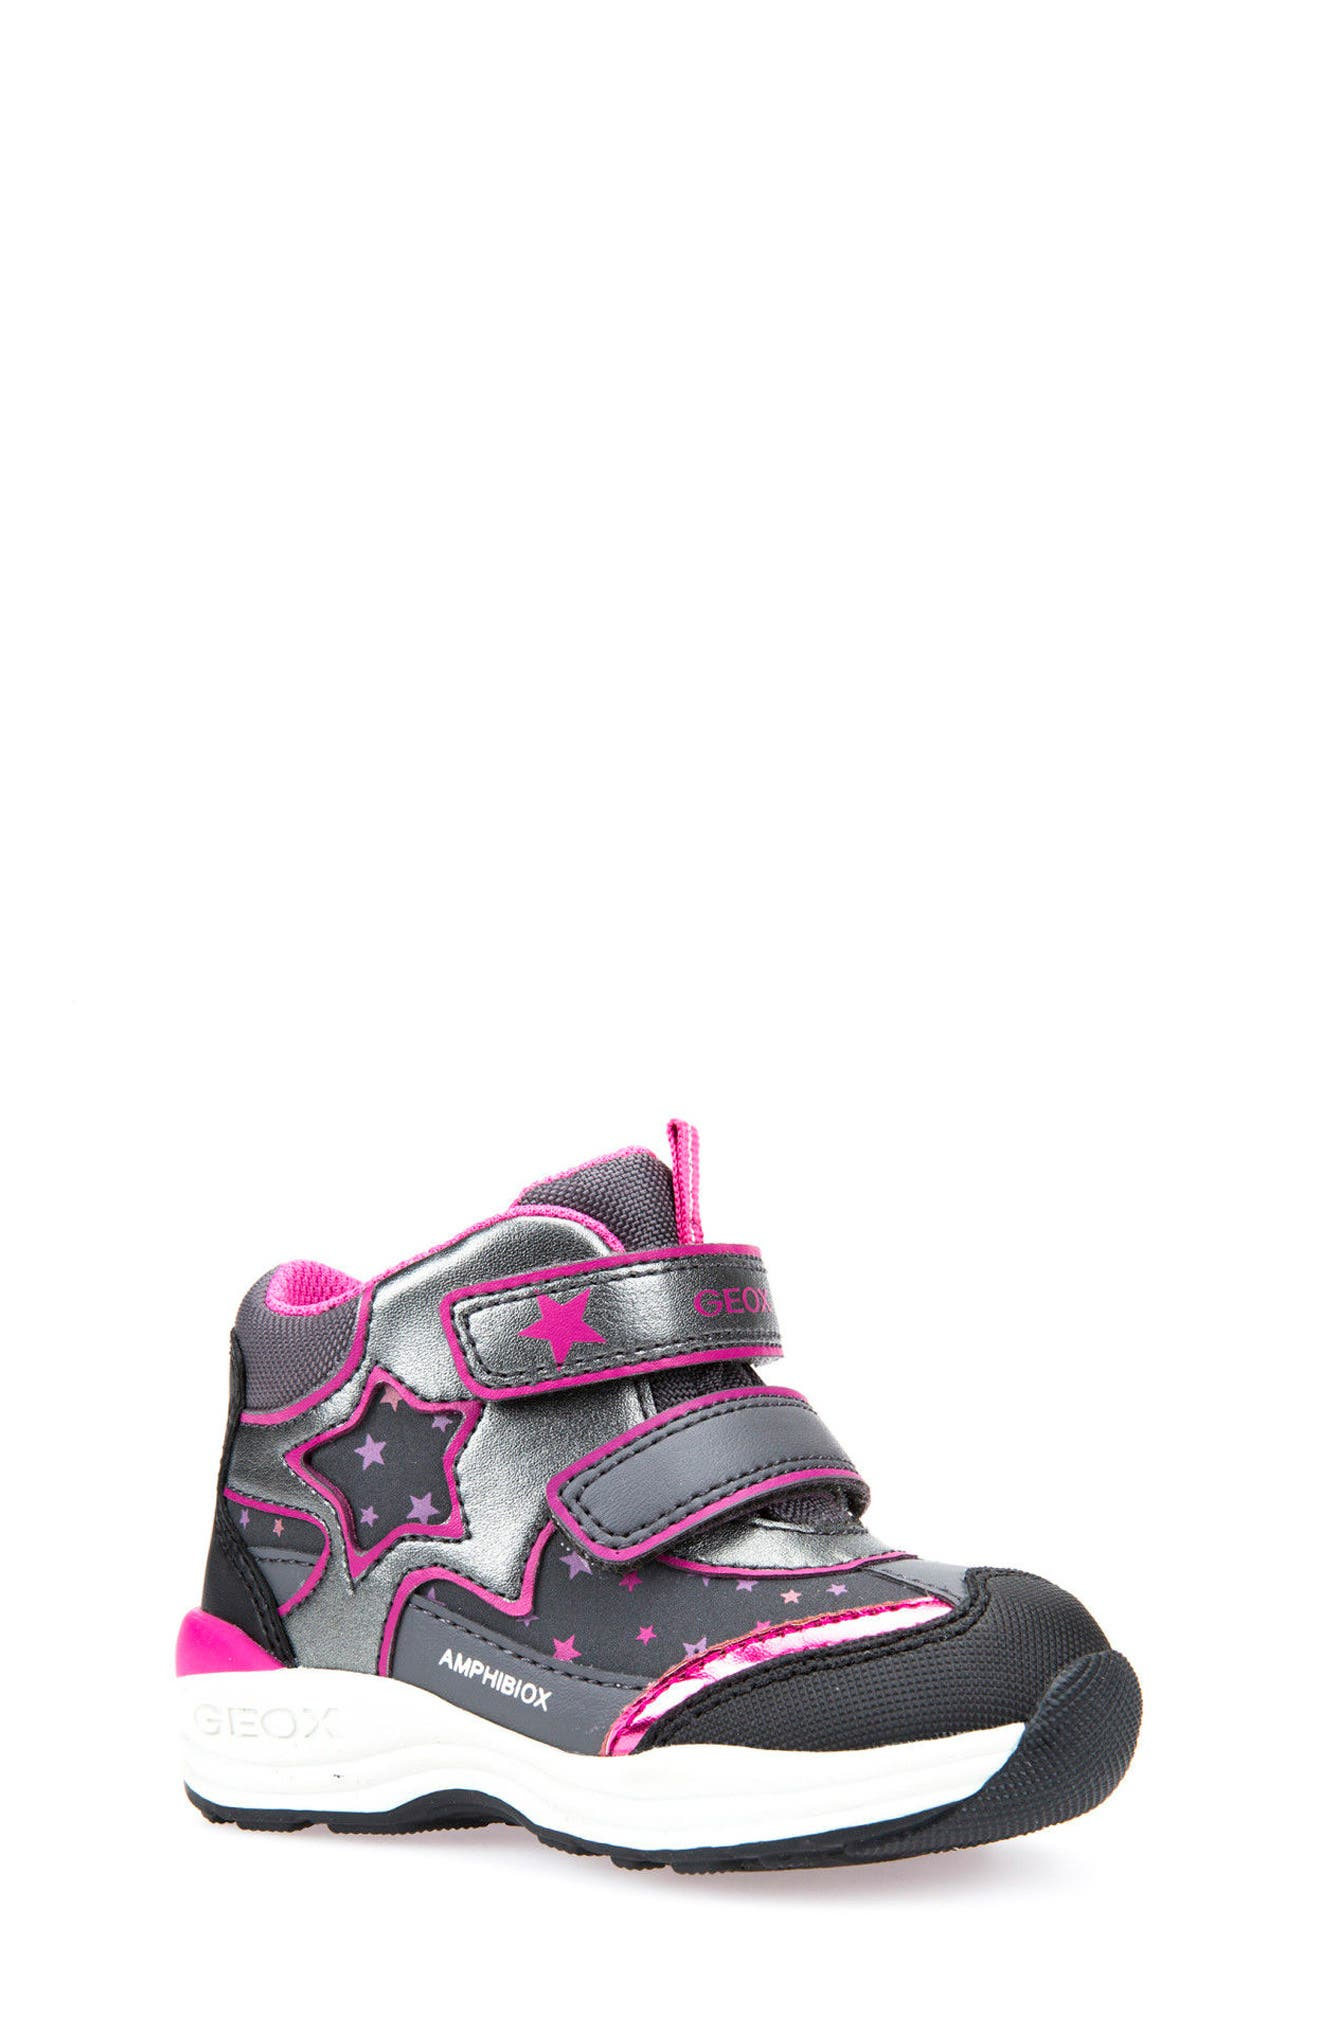 GEOX Gulp ABX Waterproof Star Sneaker Boot